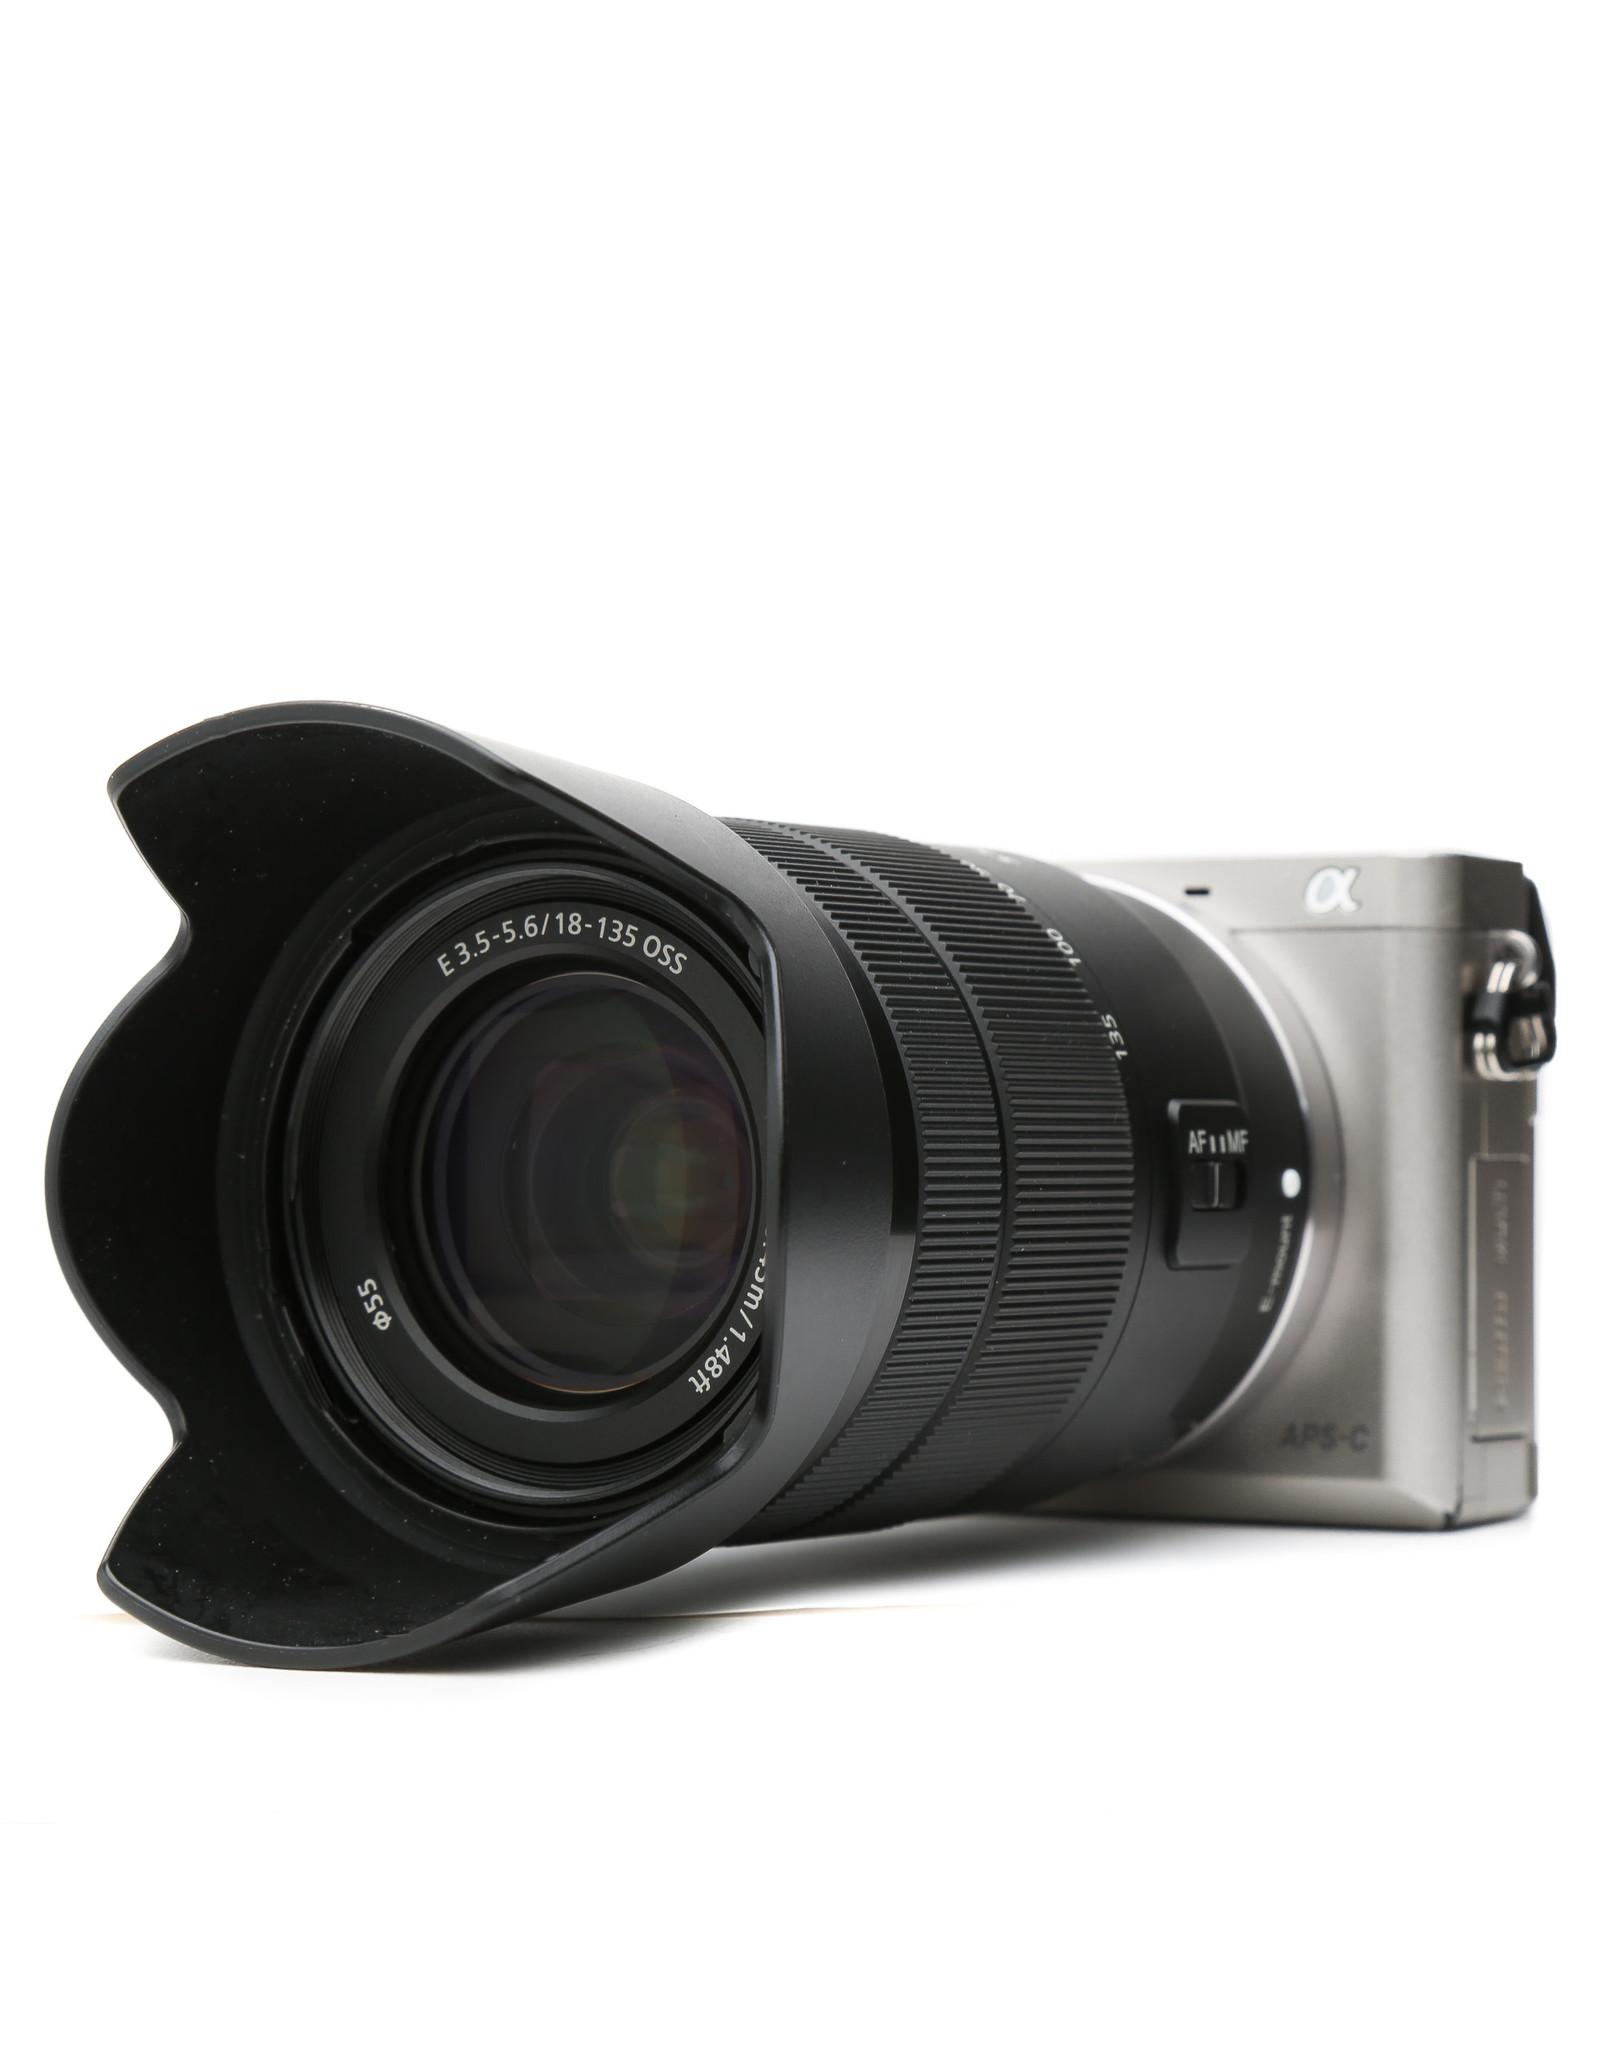 Sony Sony Alpha a6000 Mirrorless Digital Camera (Silver) with18-135mm Lens (Black)